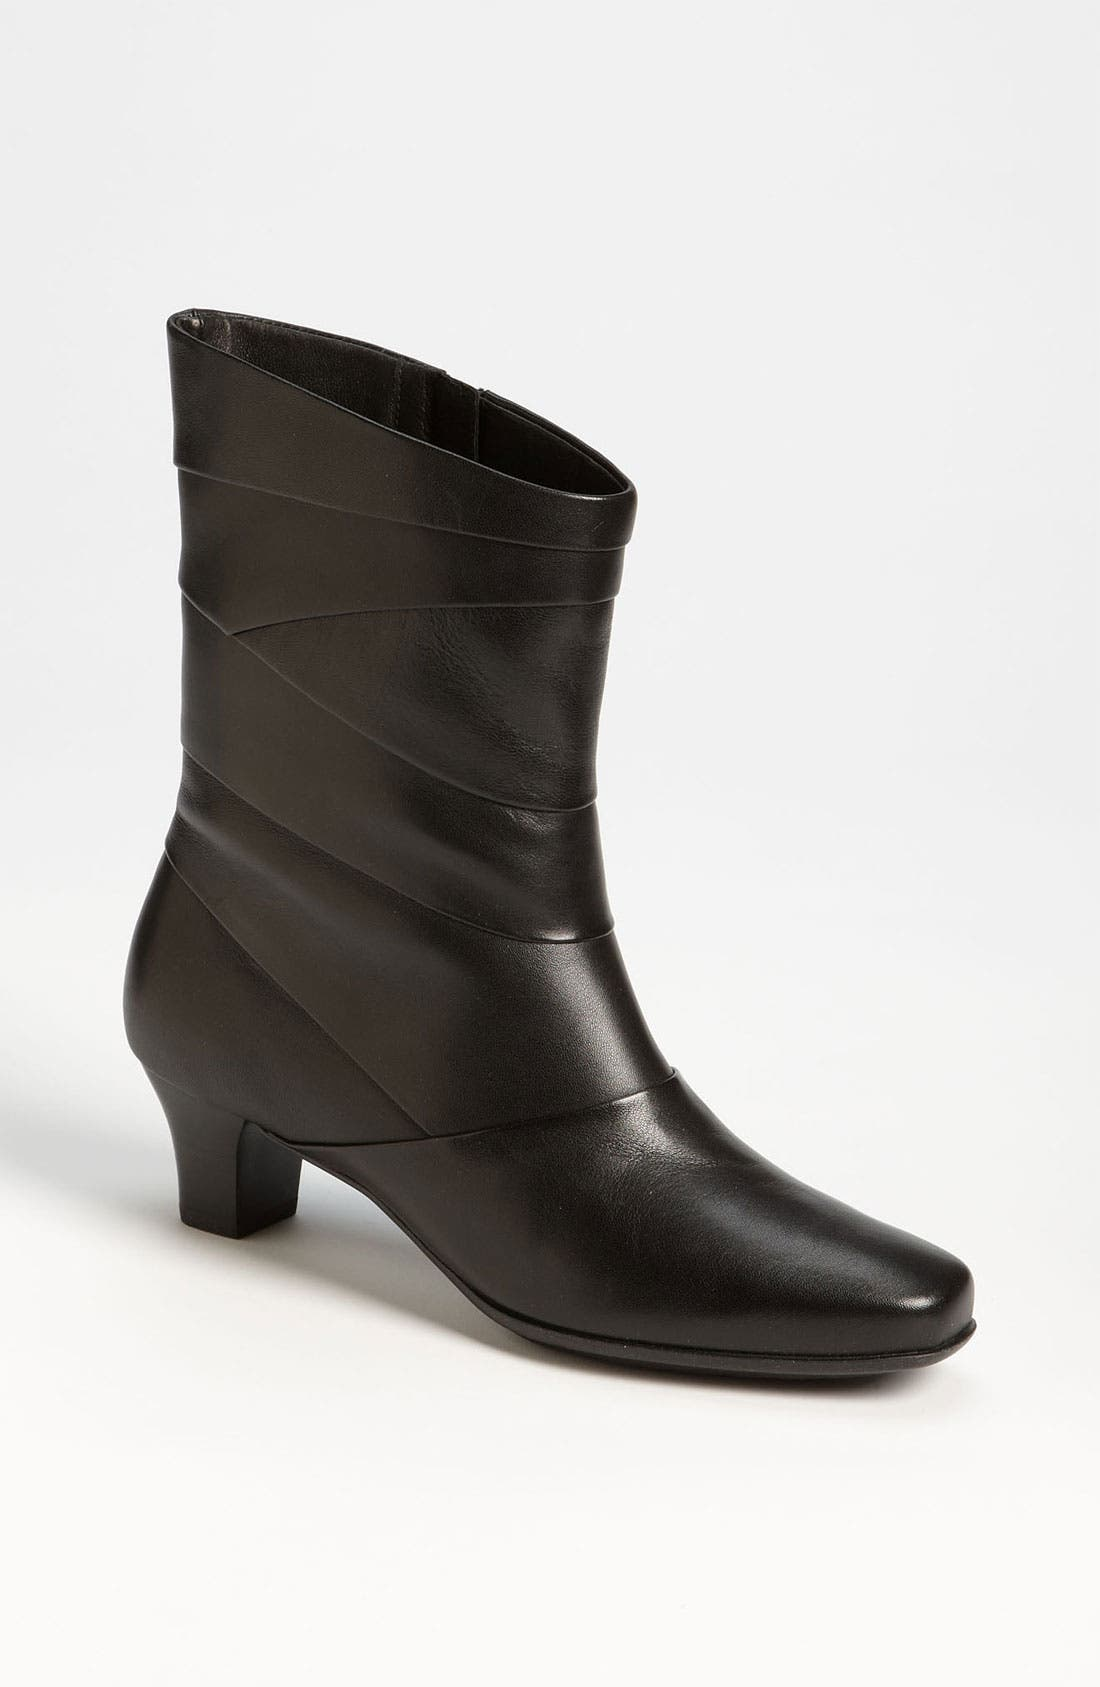 Alternate Image 1 Selected - Aravon 'Erica' Boot (Women)